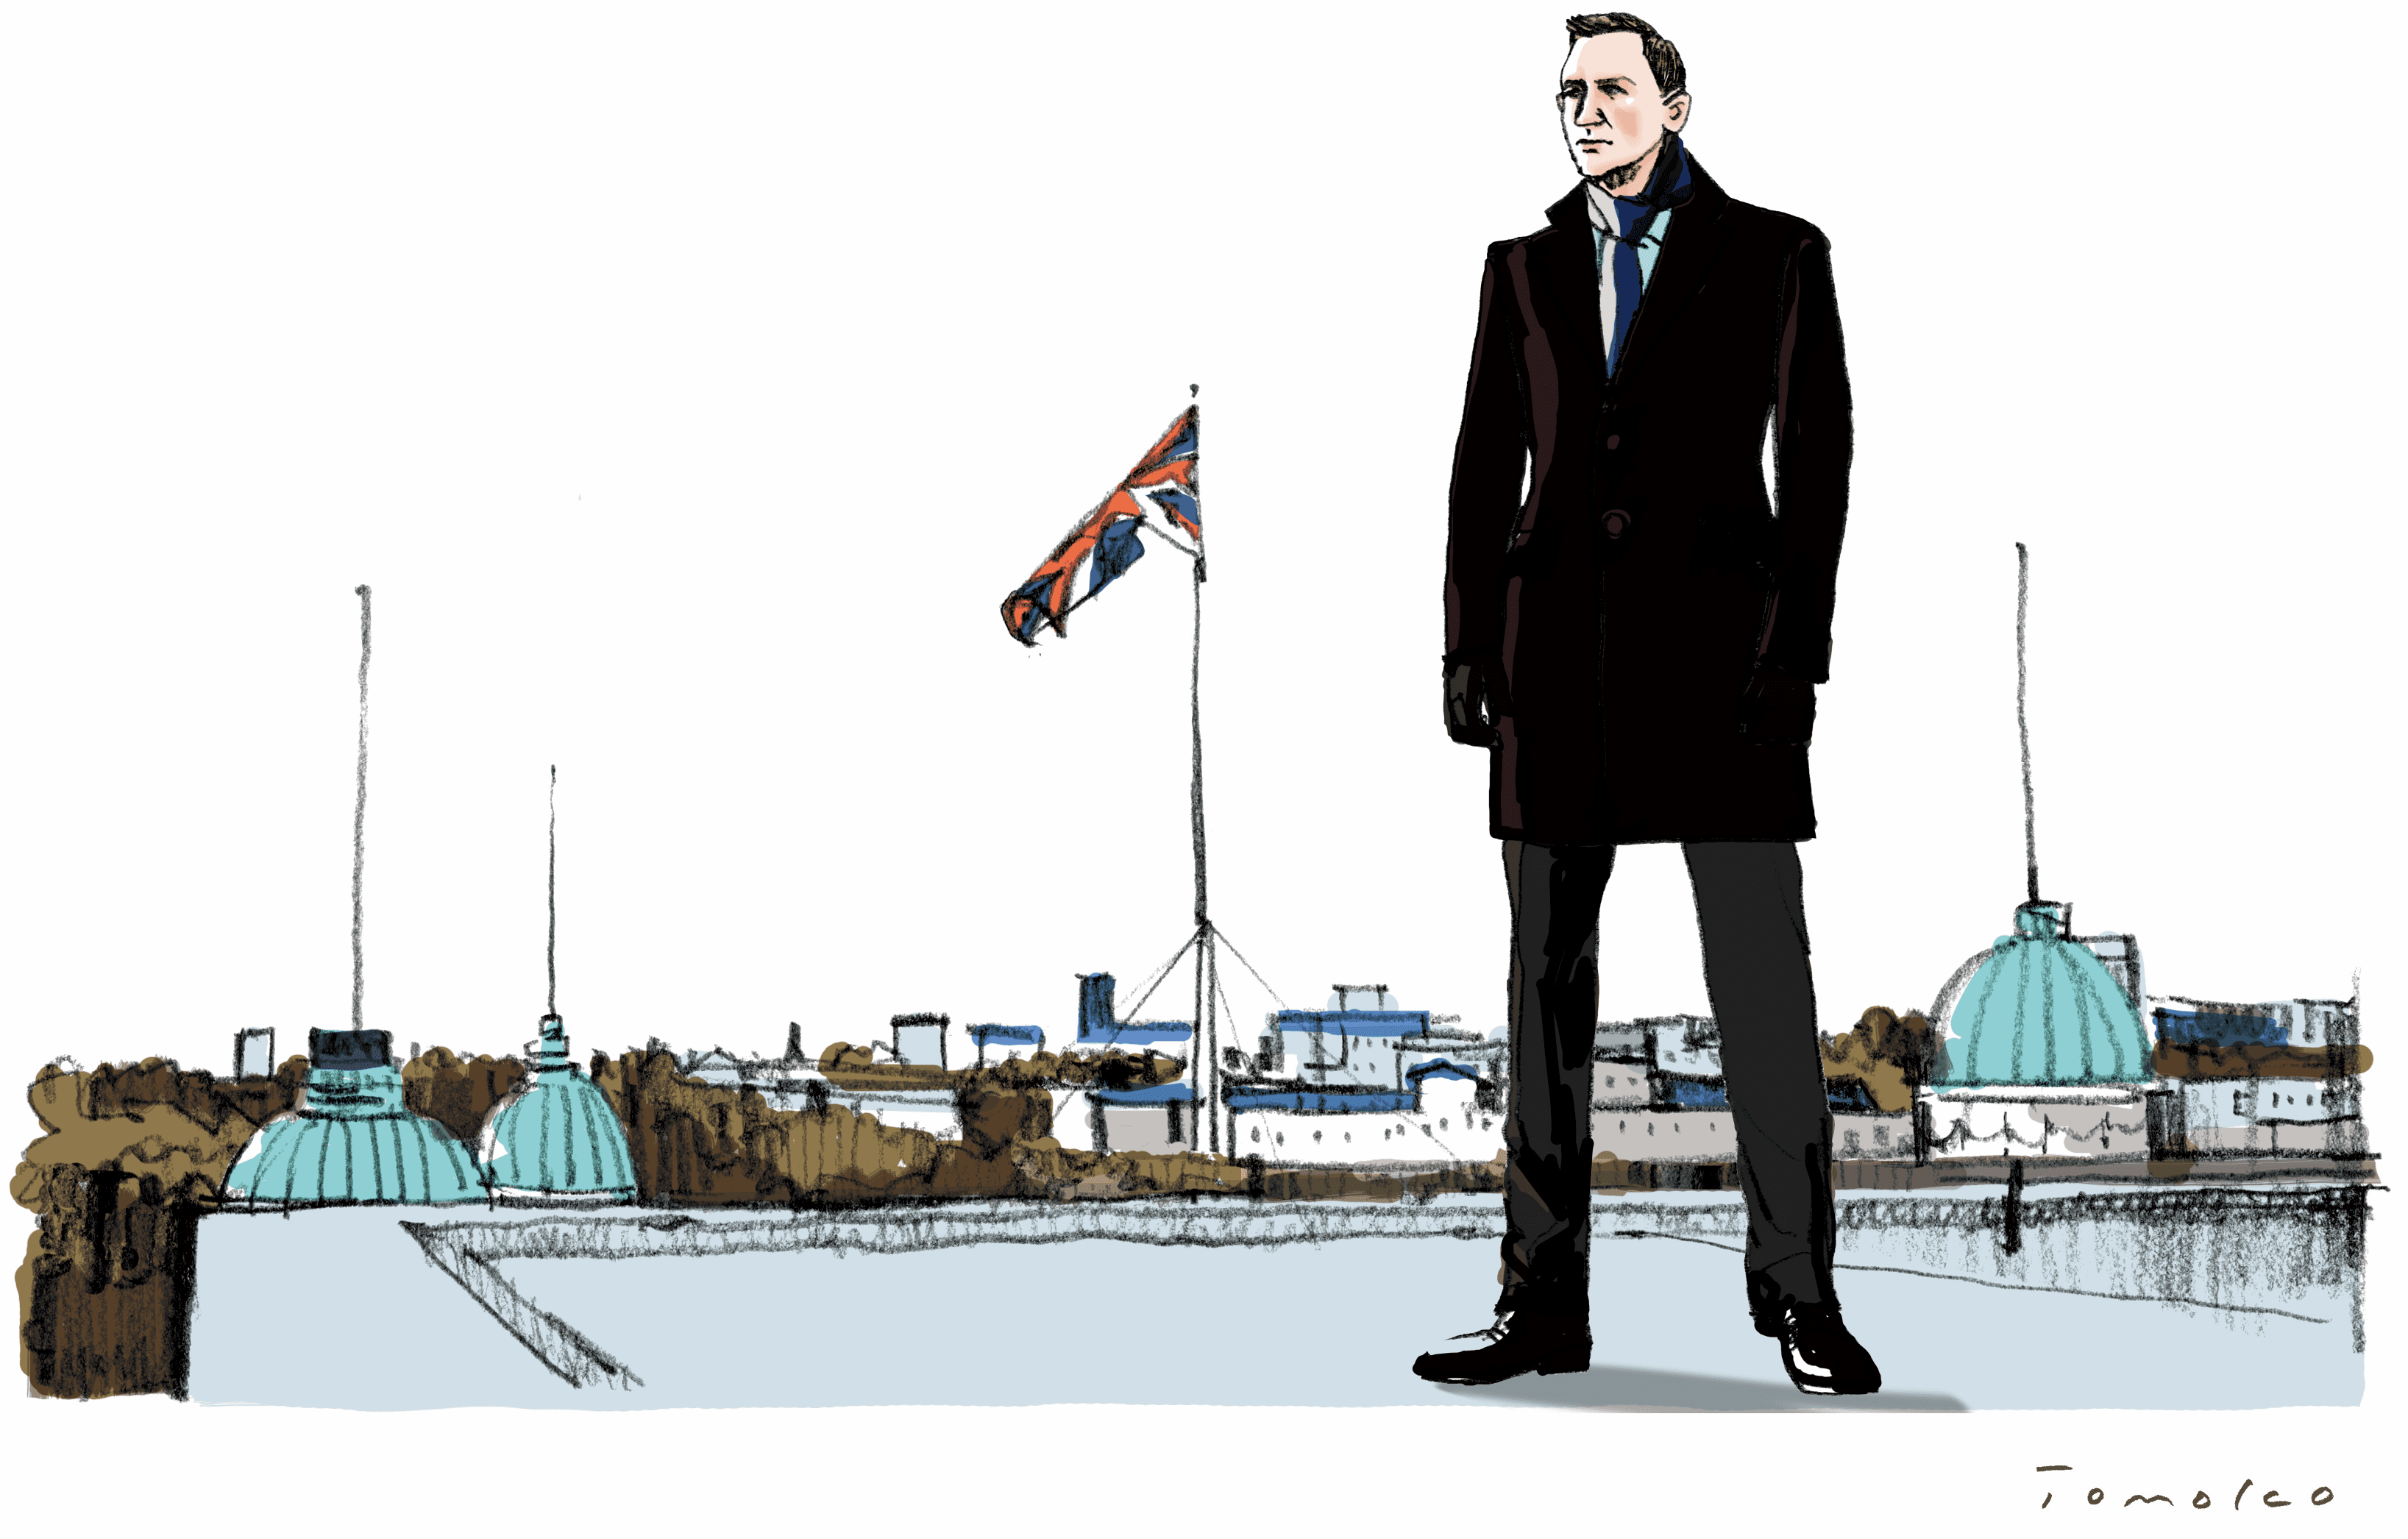 Take a Walk with James Bond ジェームズ・ボンド、ゆかりの地を歩く